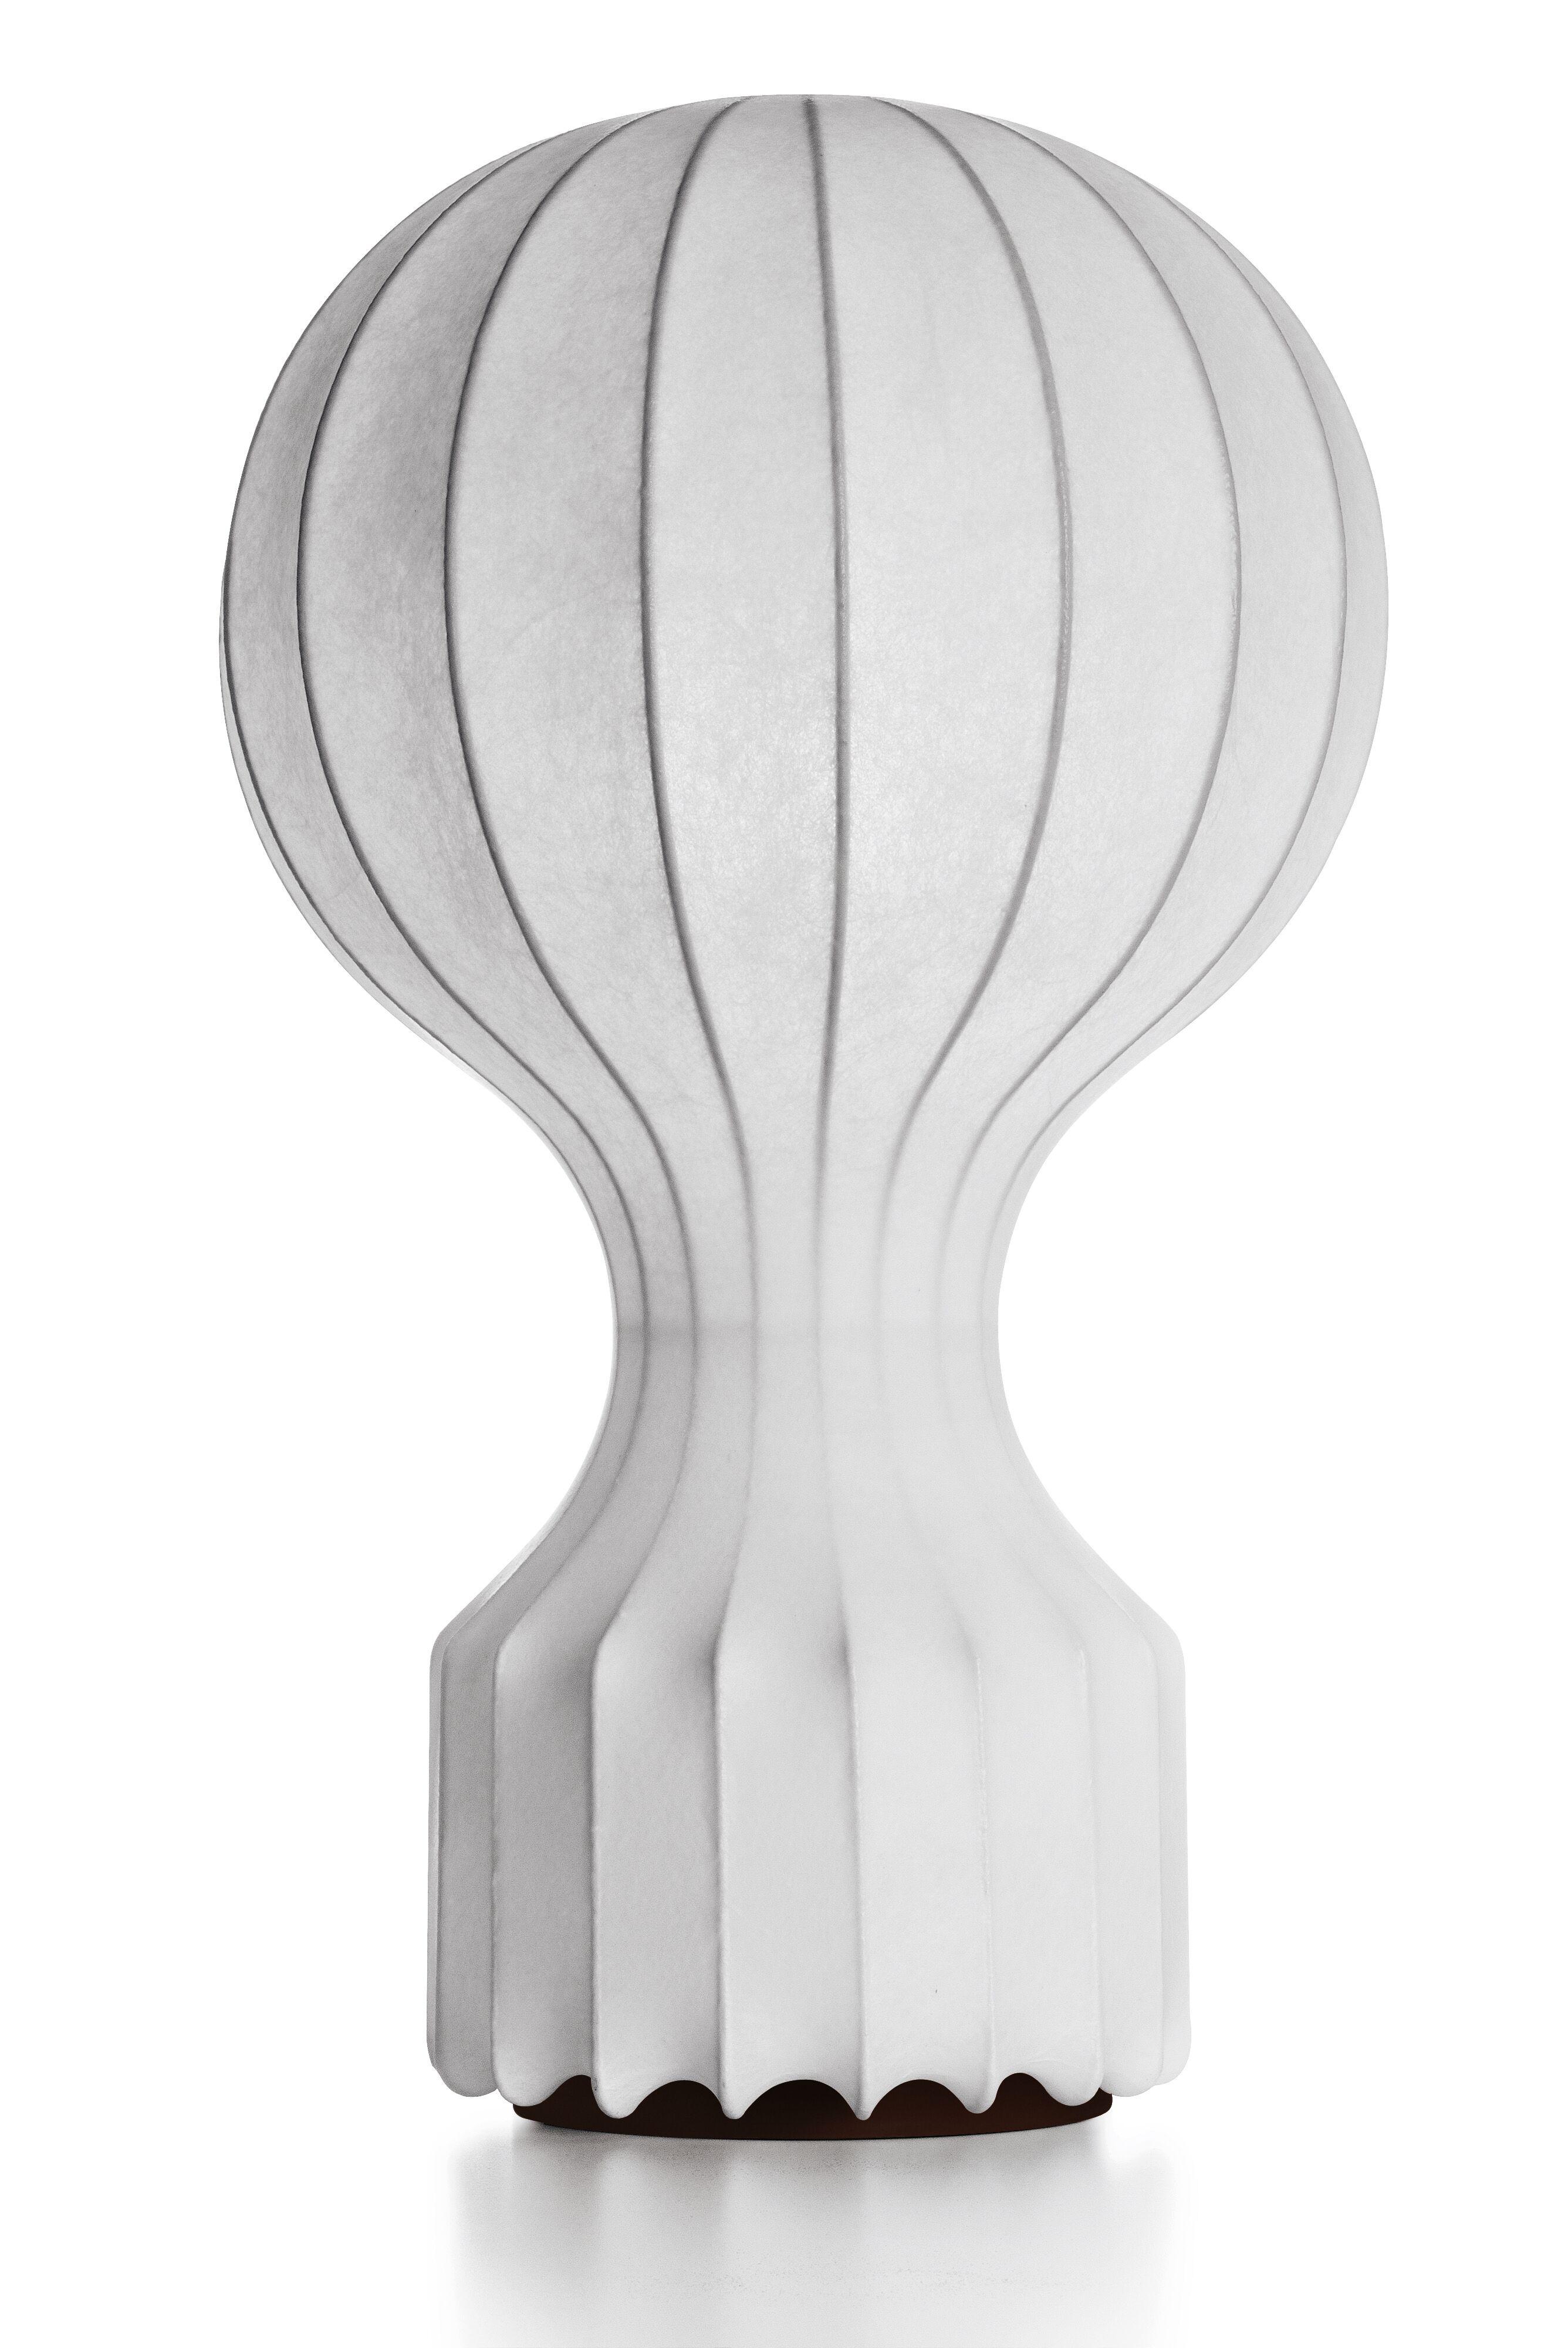 Gatto new Hvid Bordlampe - Flos